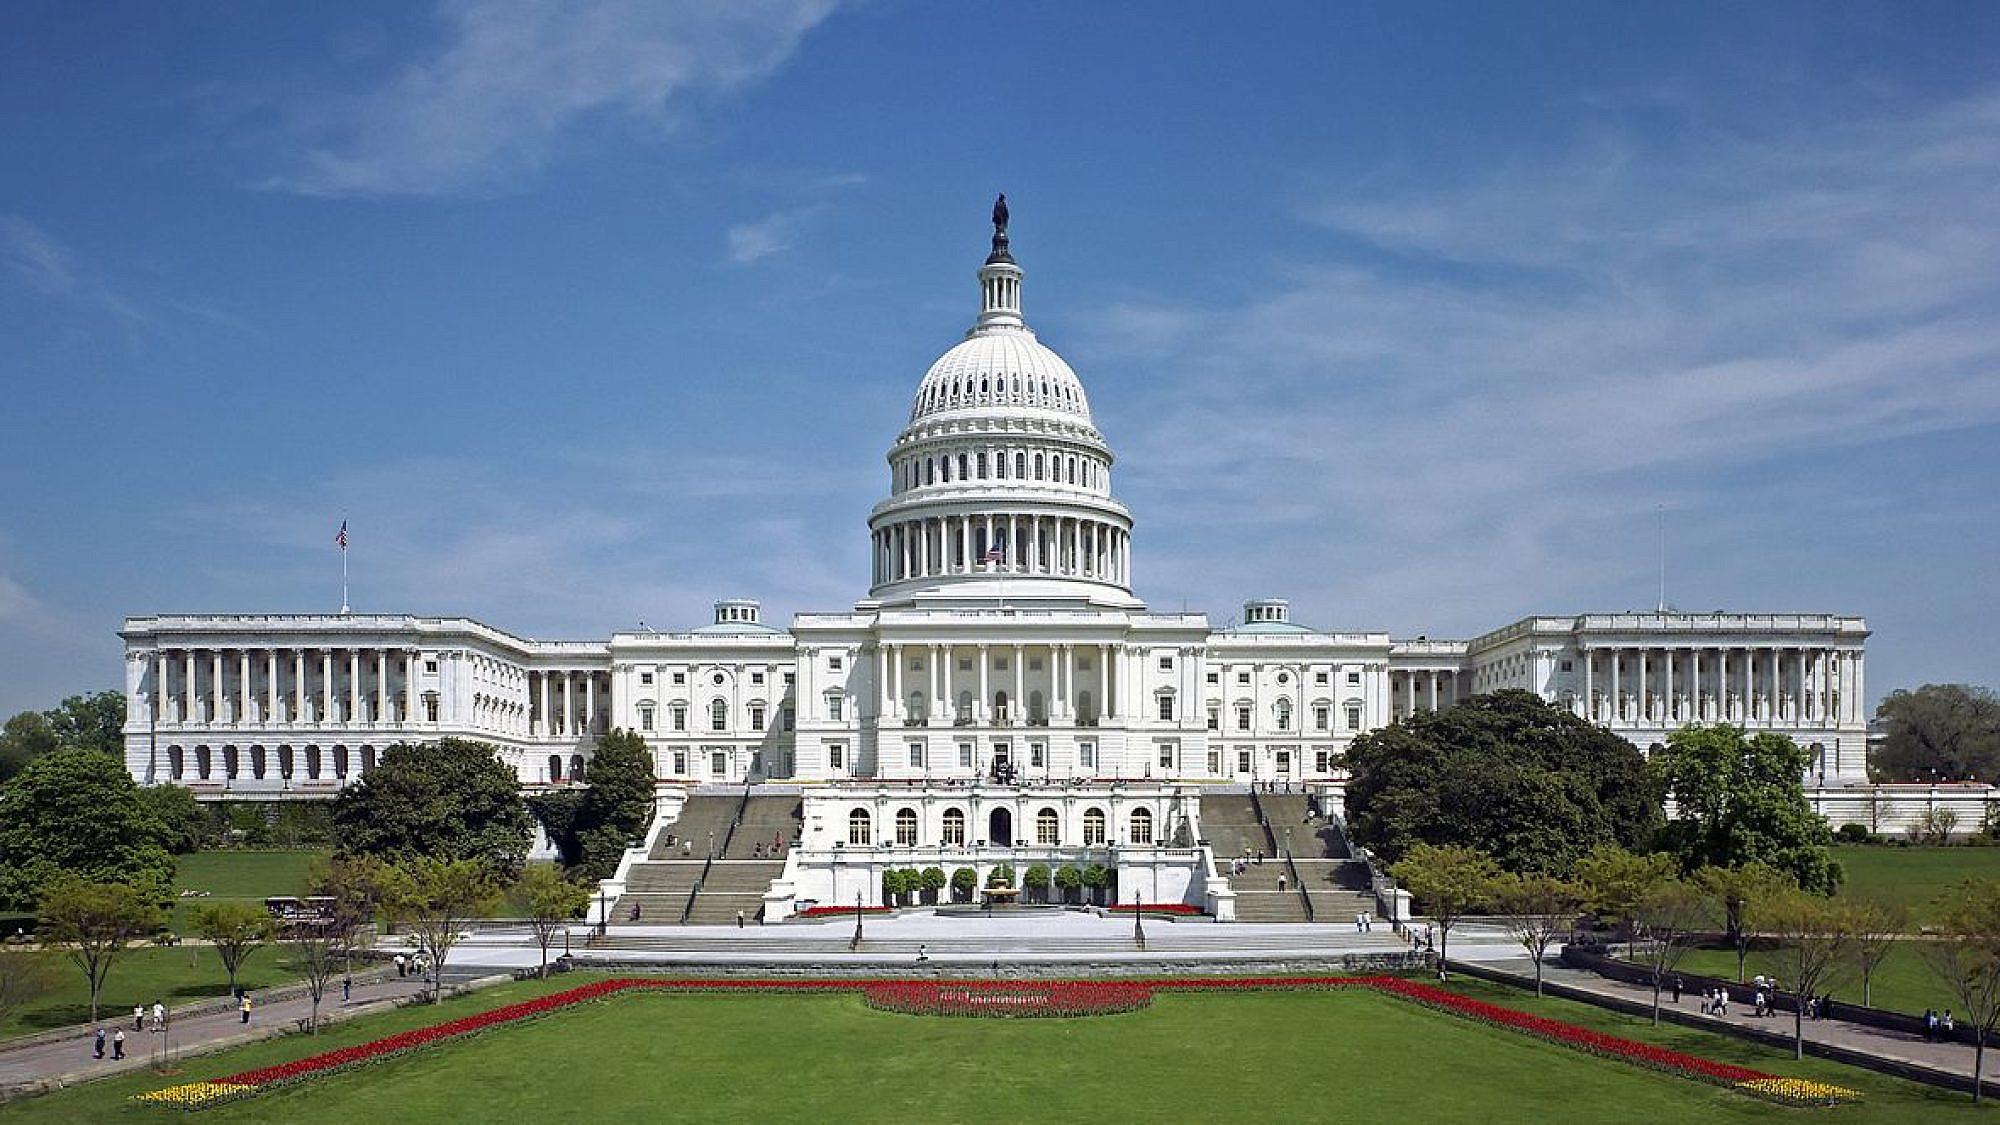 The U.S. Capitol building. Wikimedia Commons via Martin Falbisoner.